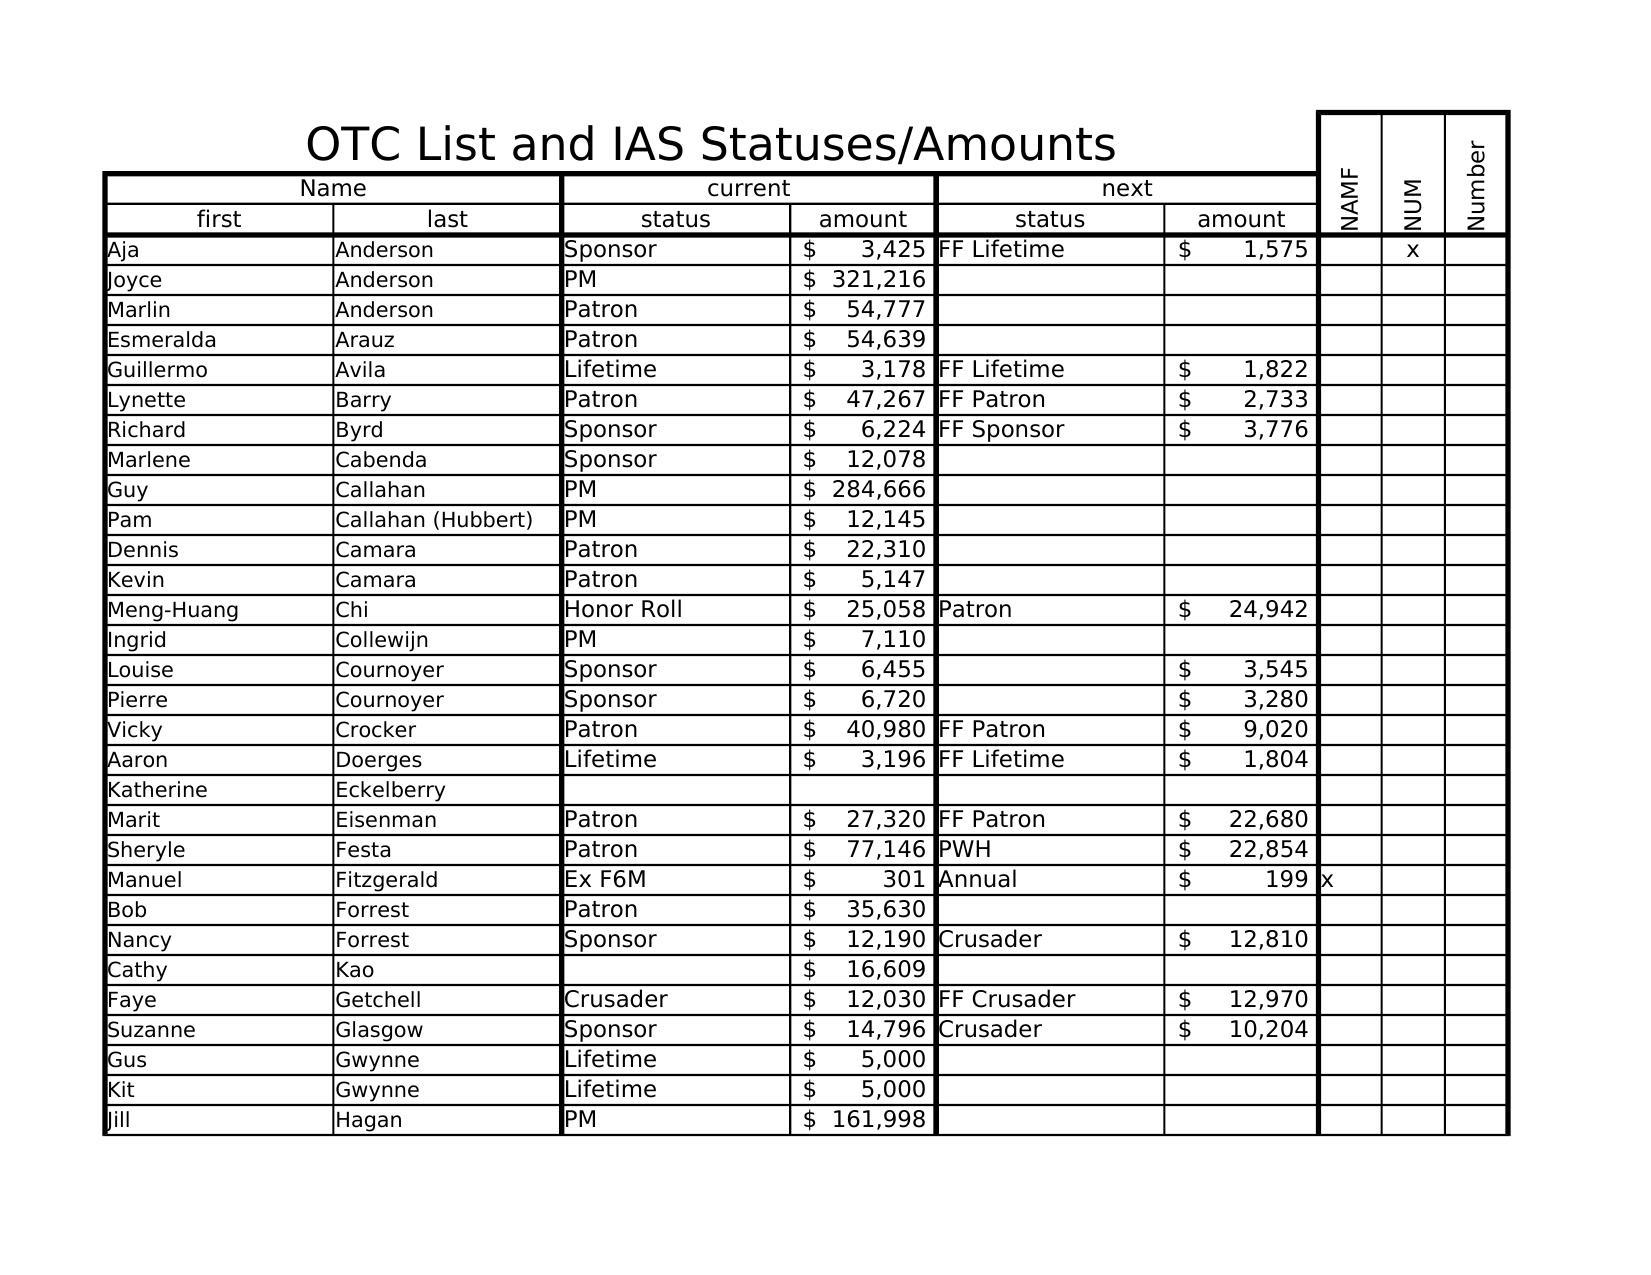 Tampa-OTC-IAS-Donations-1.jpg